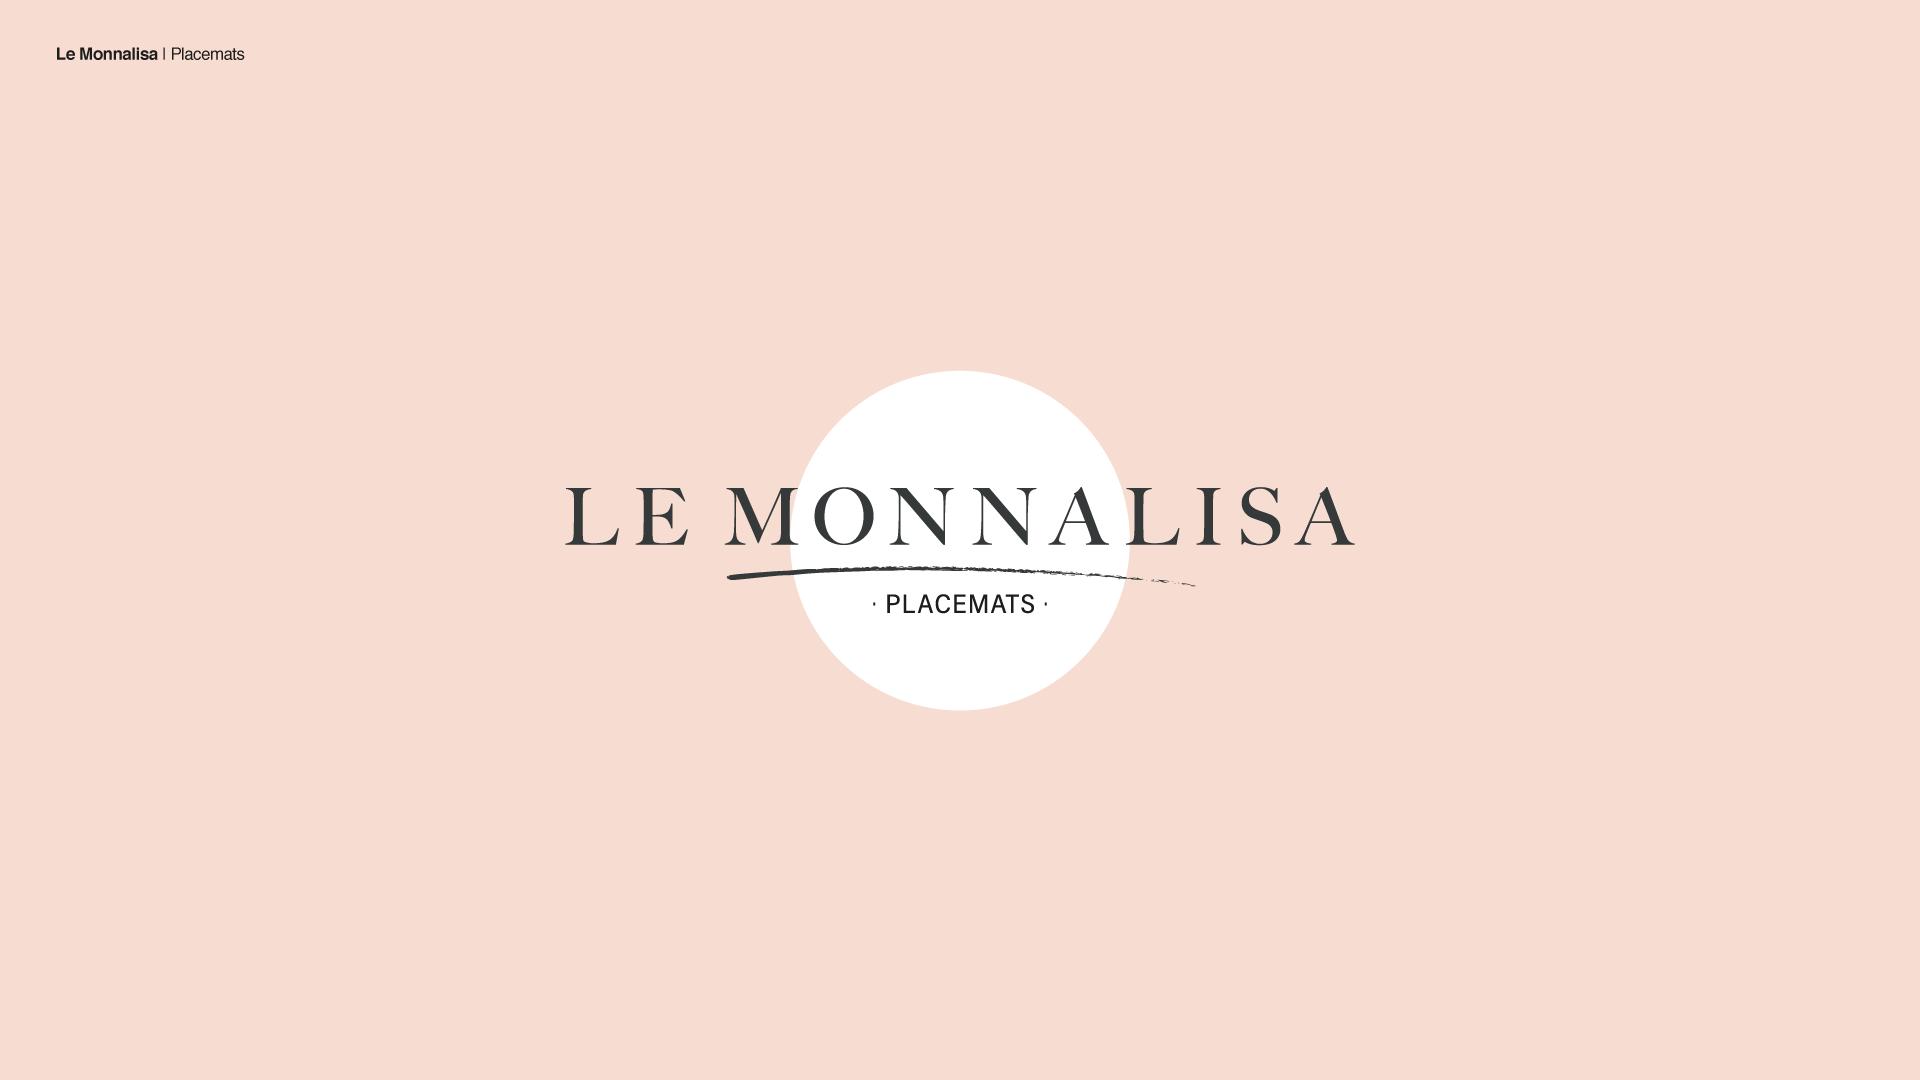 lemonnalisa